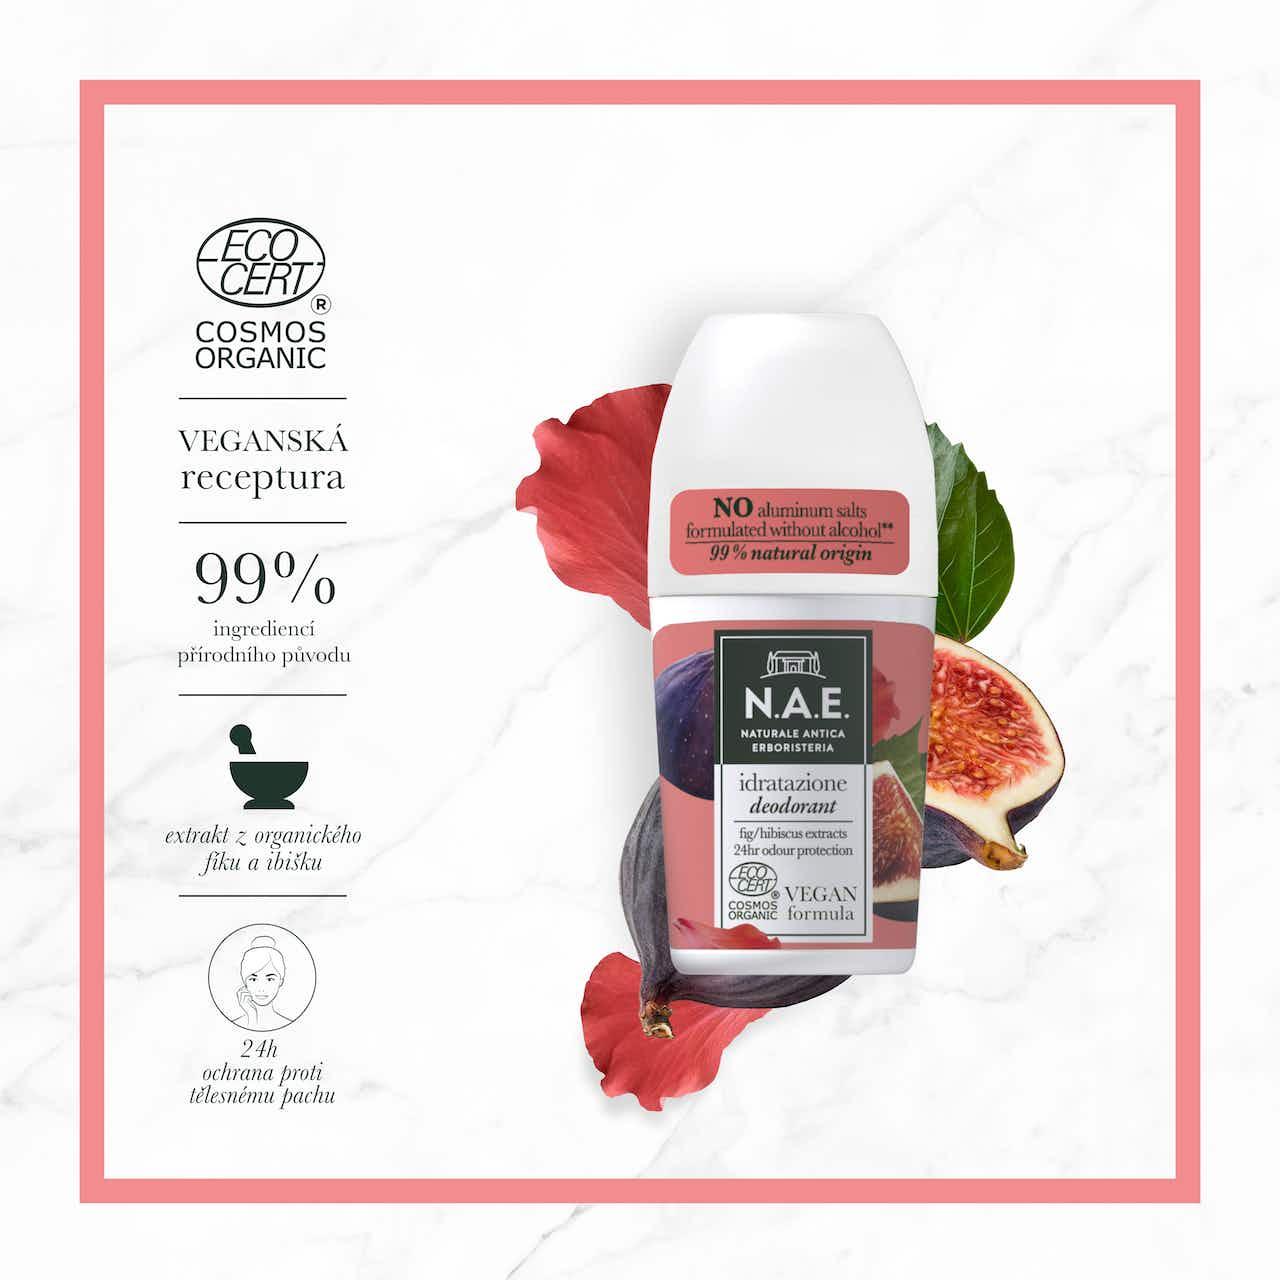 Idratazione hydratační deodorant